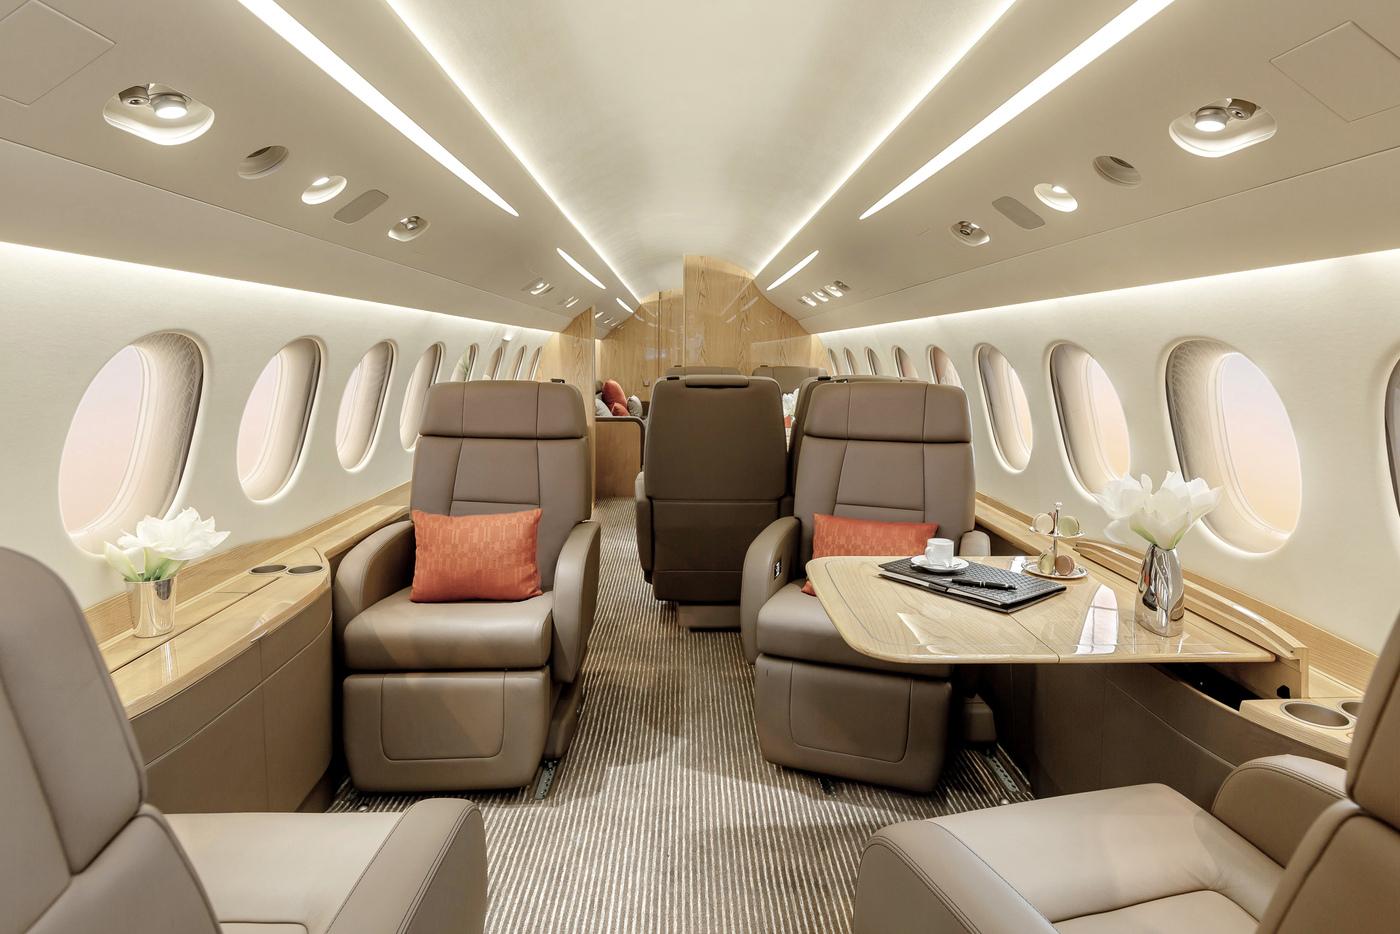 LX-LXL-interior-plane